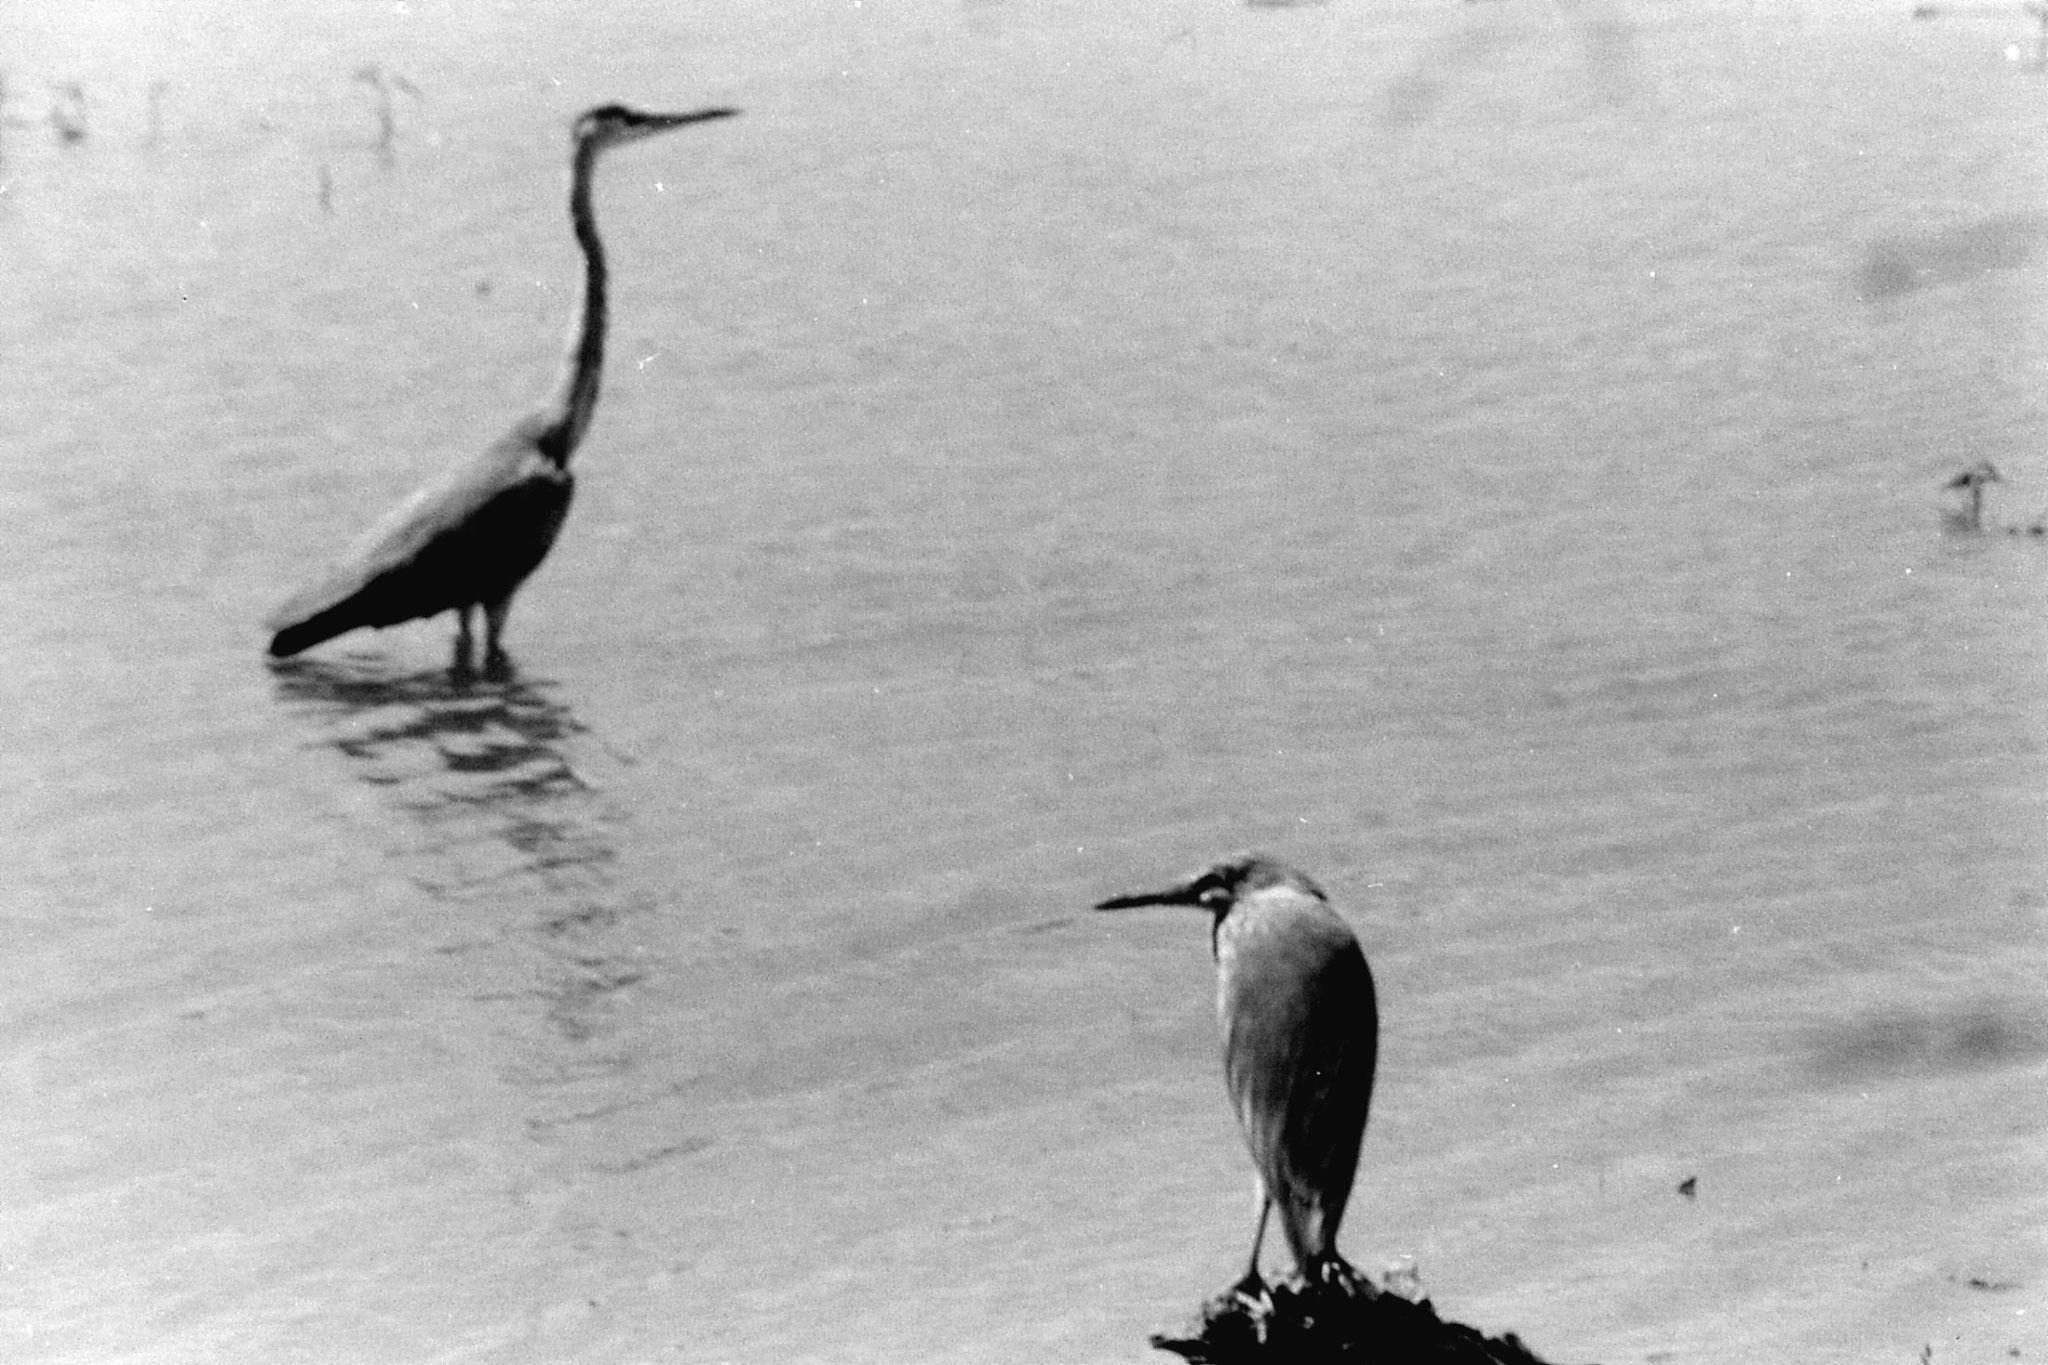 1/4/1990: 8: Bharatpur darter and heron